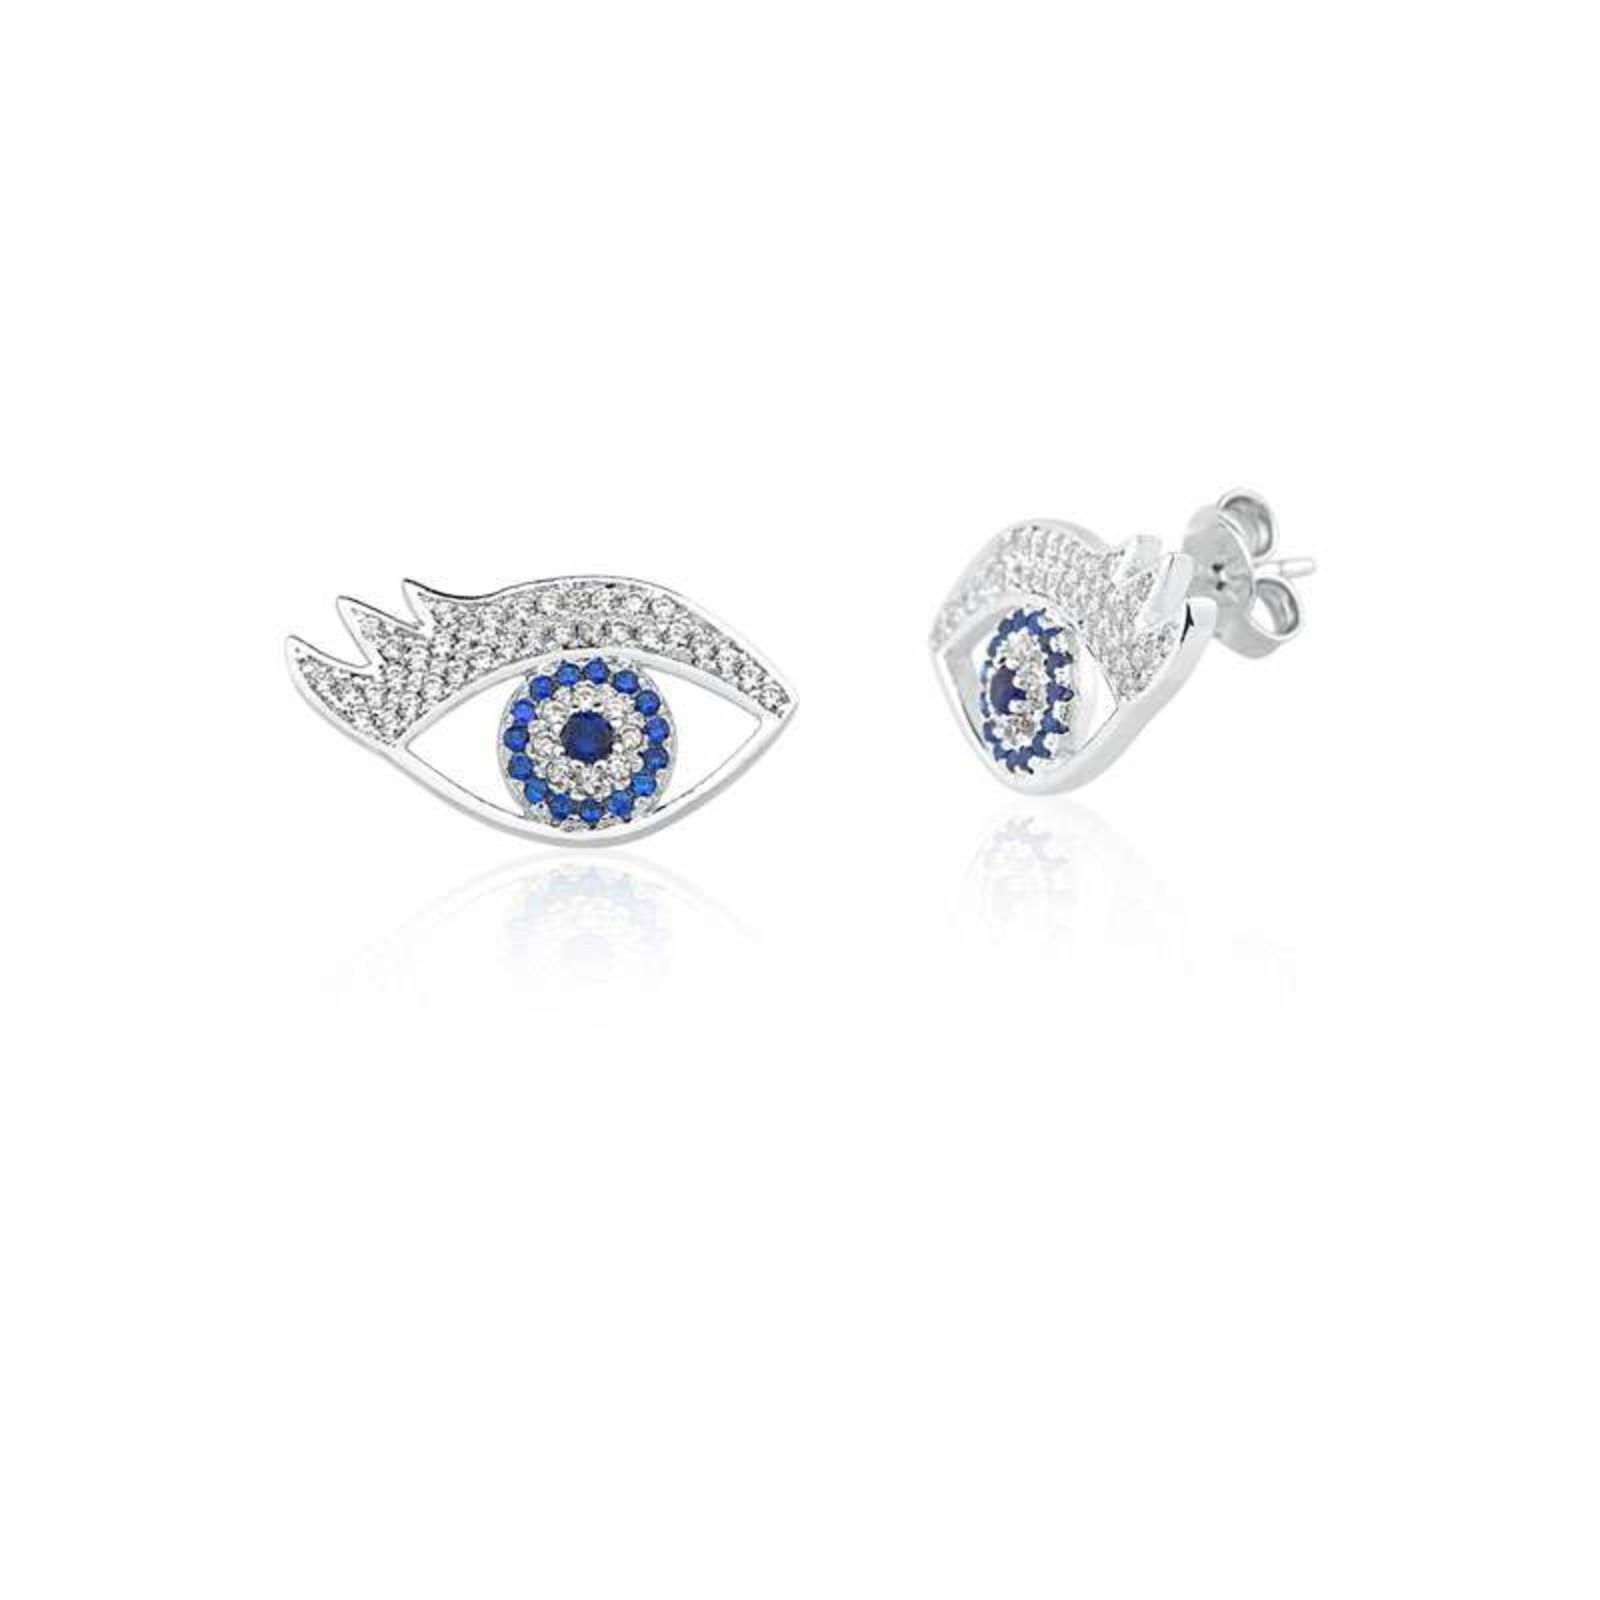 Brinco Le Diamond Olho de Zircônia Azul